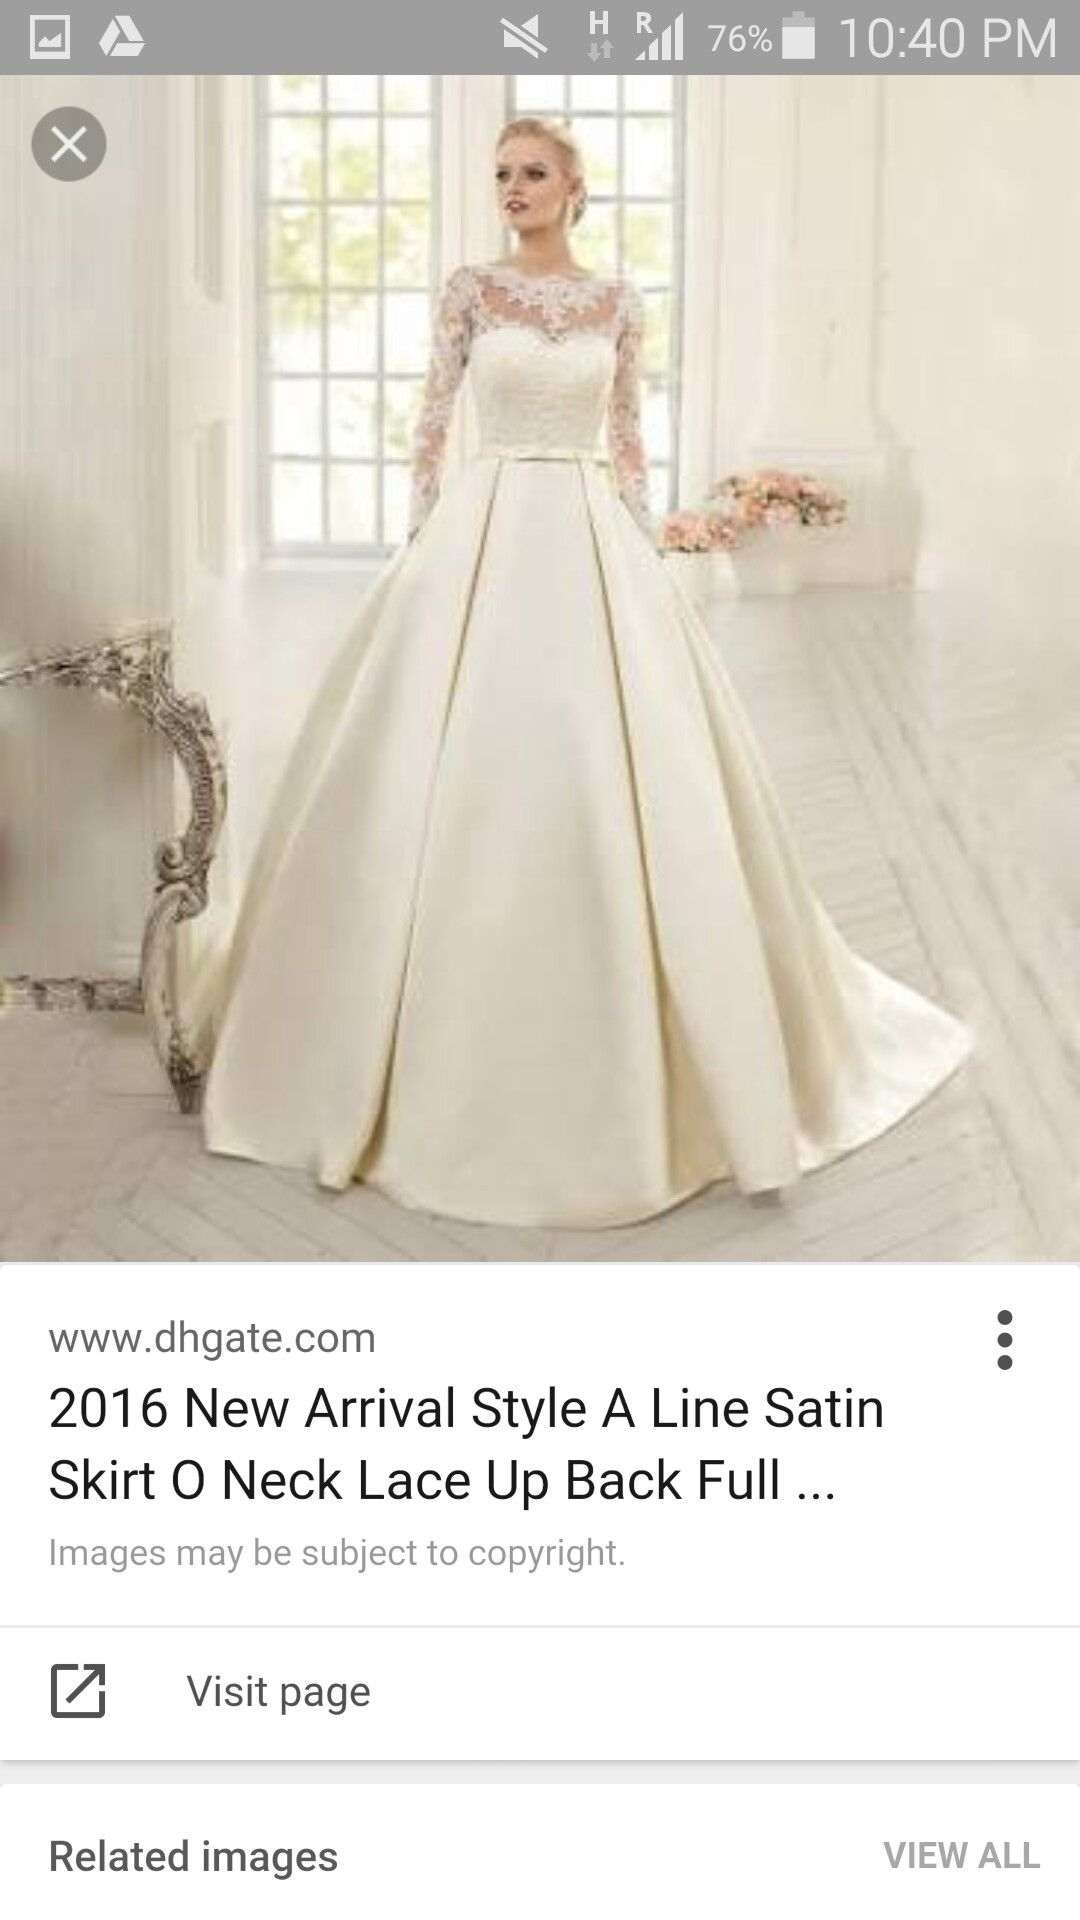 Pin by celeste poulton on wedding pinterest wedding dress